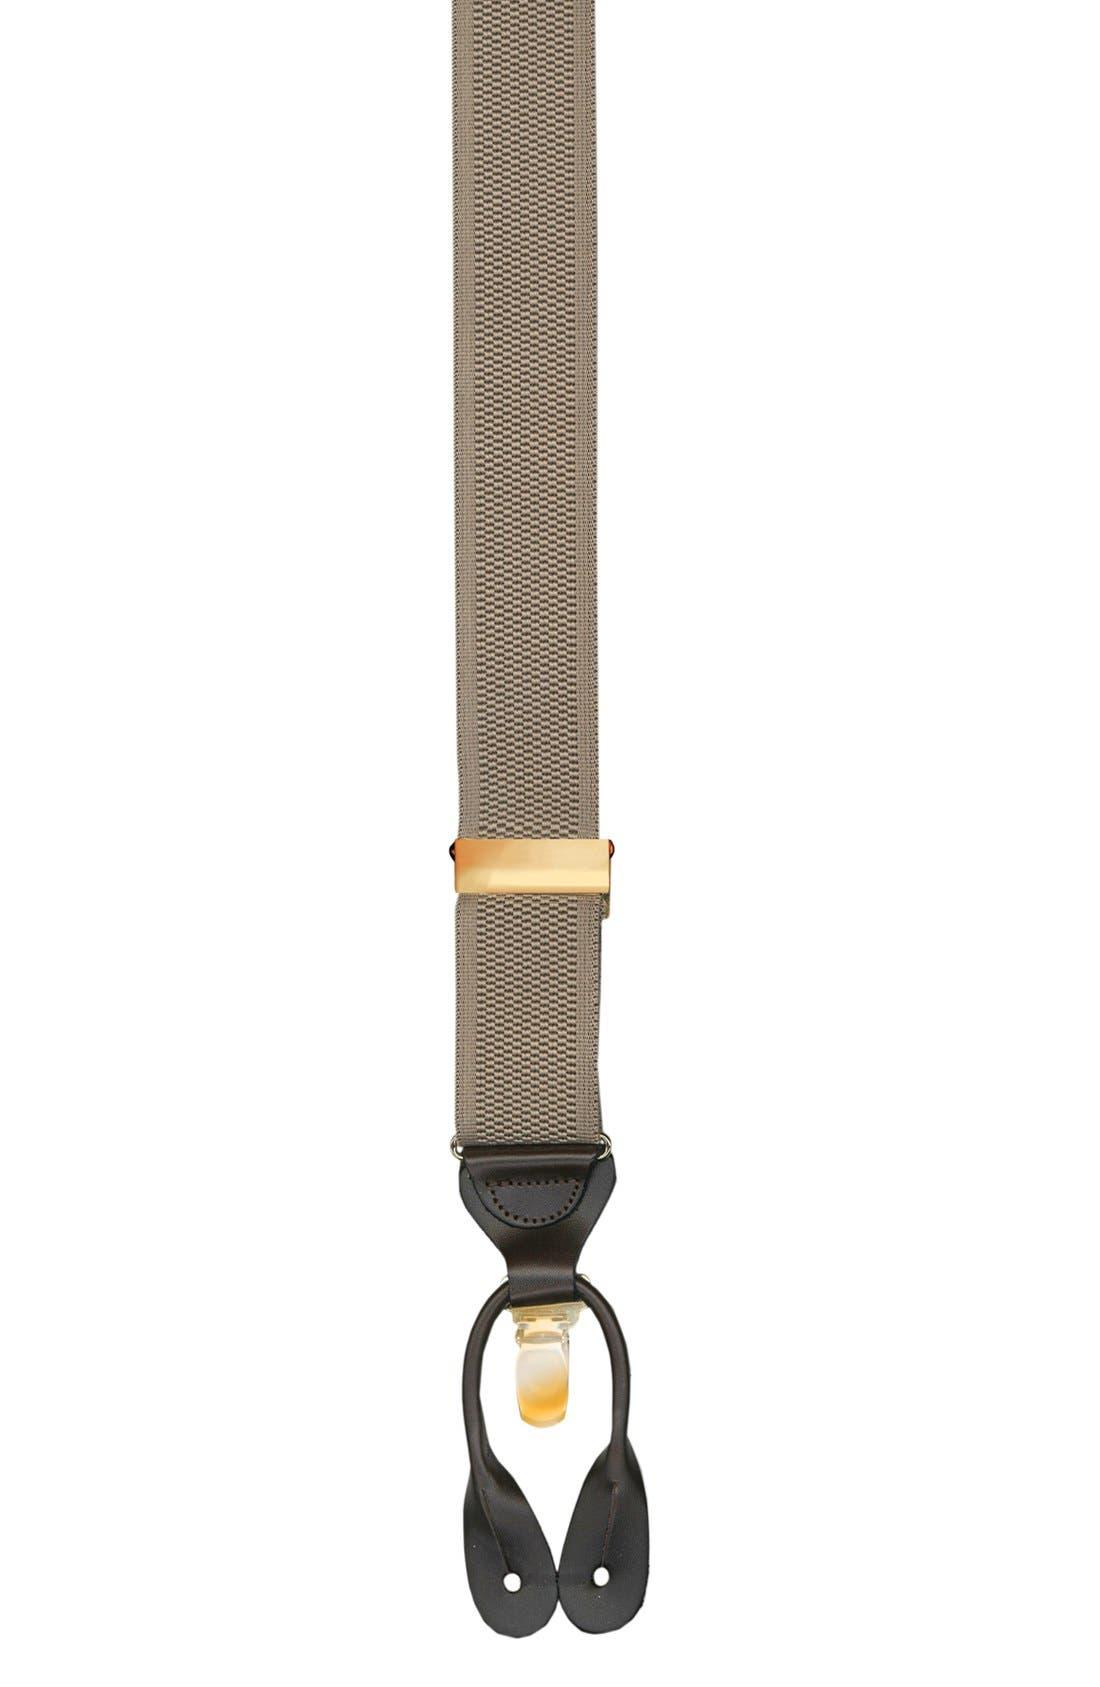 Convertible Stretch Nylon Suspenders,                         Main,                         color, Khaki